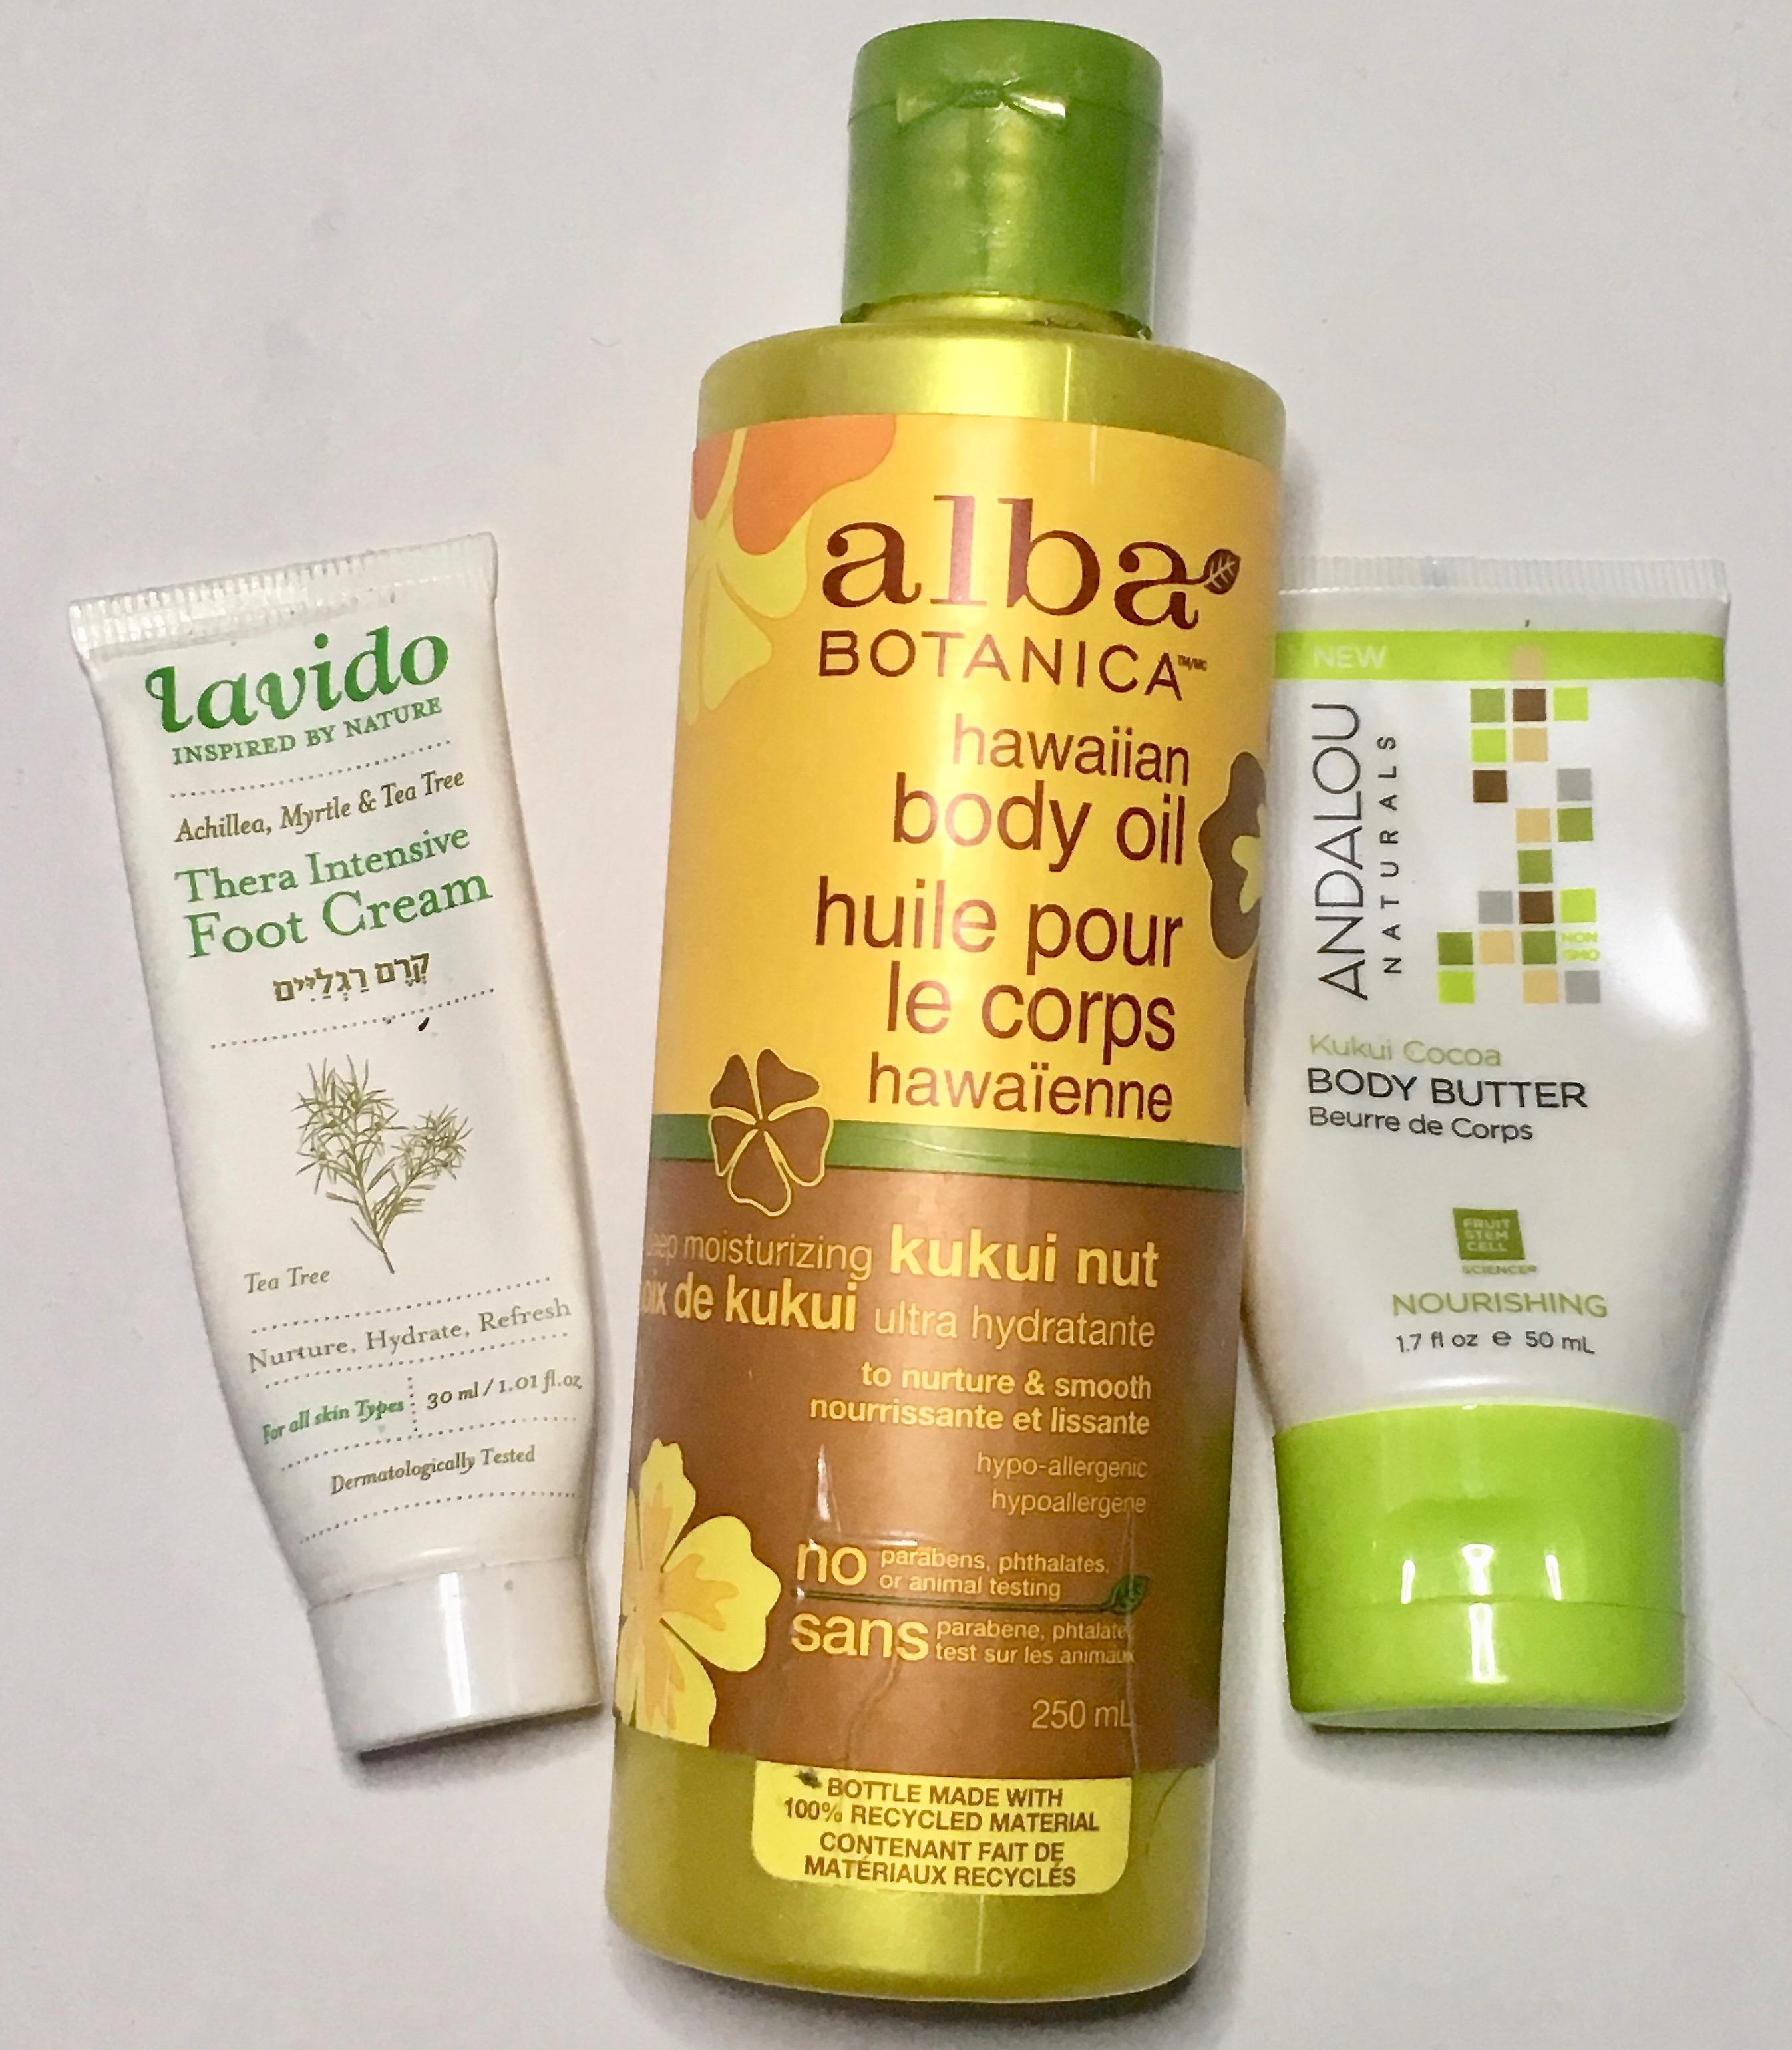 August 2019 Empties - Bath & Body - Lavido, Alba Botanica, Andalou Naturals